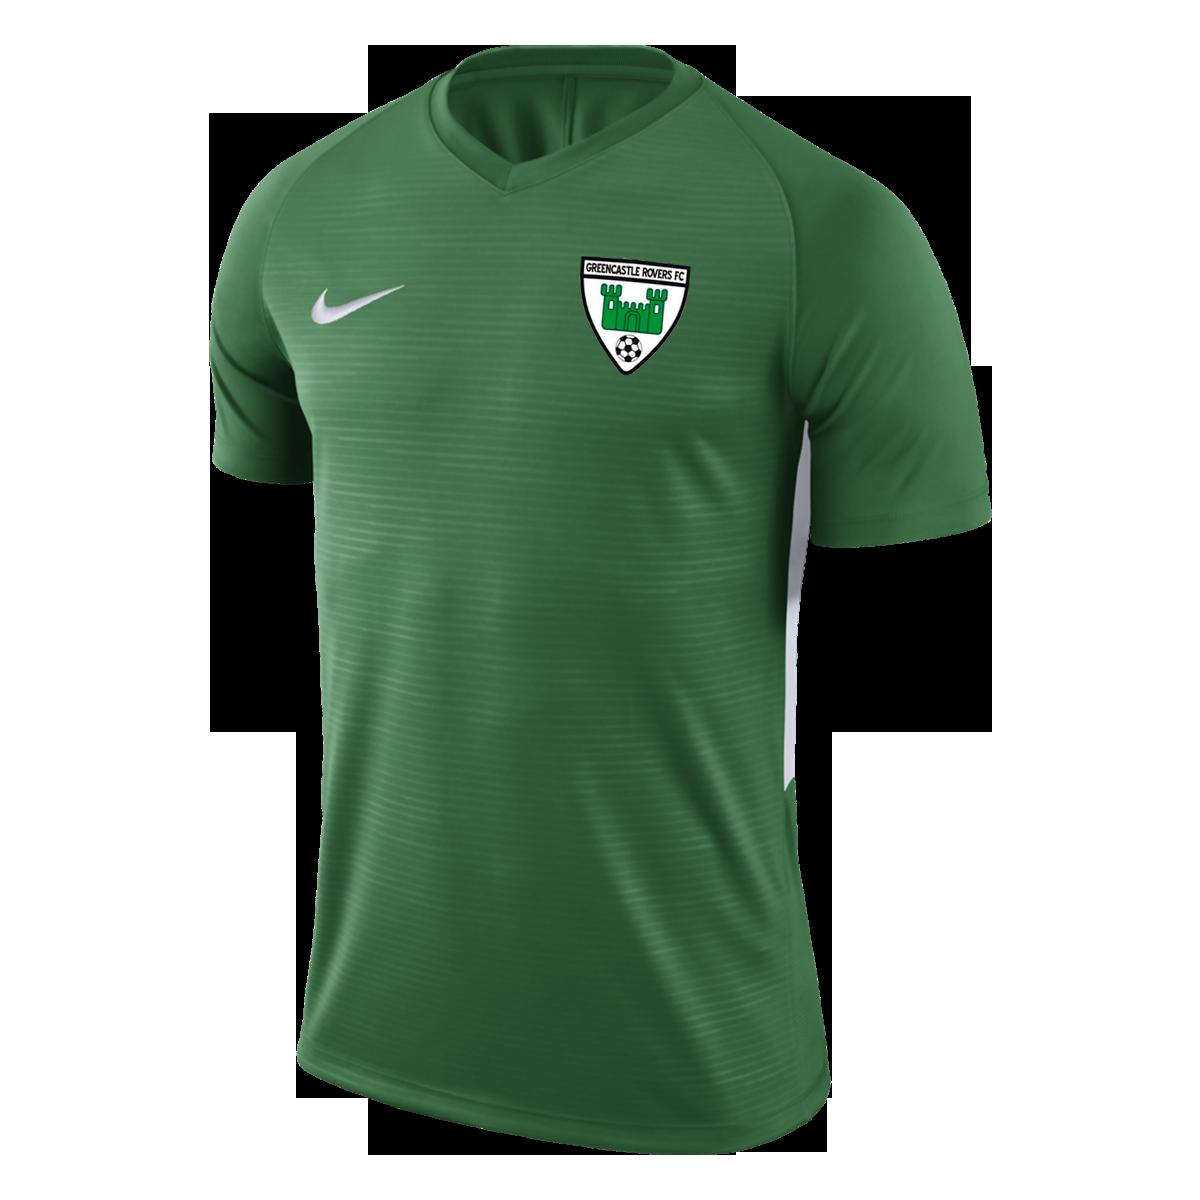 greencastle rovers green tiempo jersey 38800 p